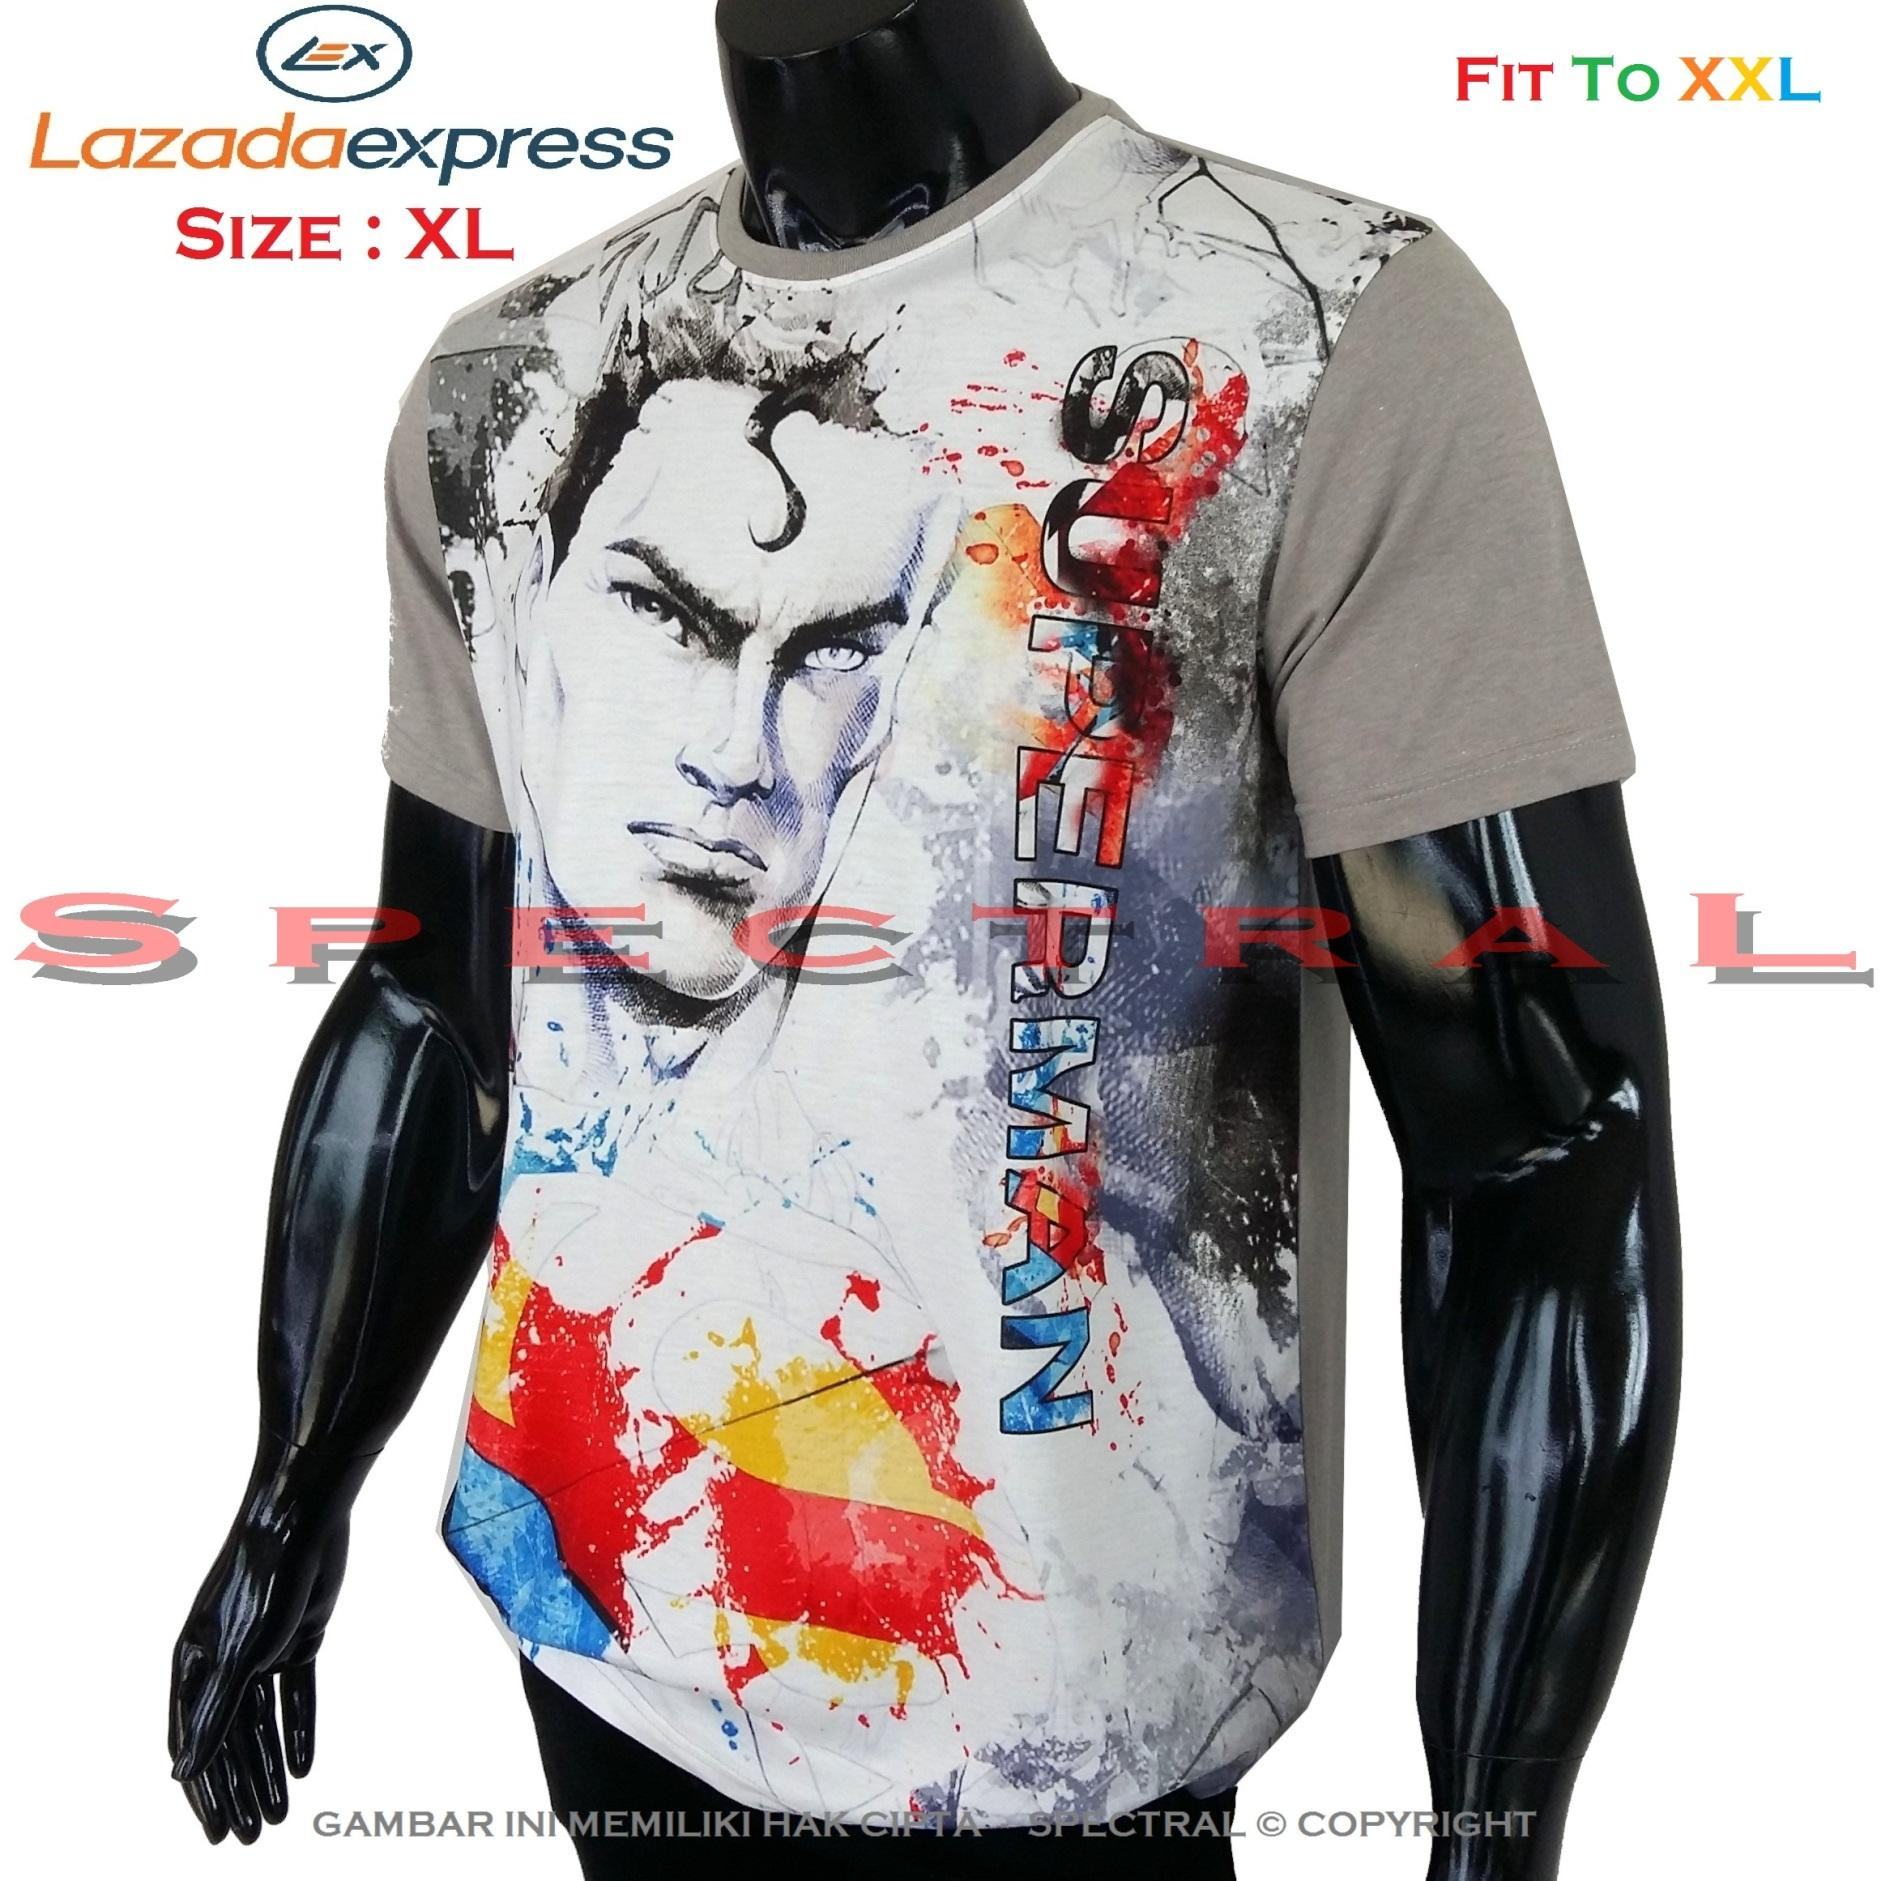 Spectral – 3D SUPERMAN Kualitas HD Printing Size XL Fit To XXL Soft Rayon Viscose Kaos Distro Fashion T-Shirt Atasan Baju Pakaian Polos Pria Wanita Cewe Cowo Lengan Murah Bagus Keren Jaman Kekinian Jakarta Bandung Gambar Marvel Avenger Joker Batman Iron